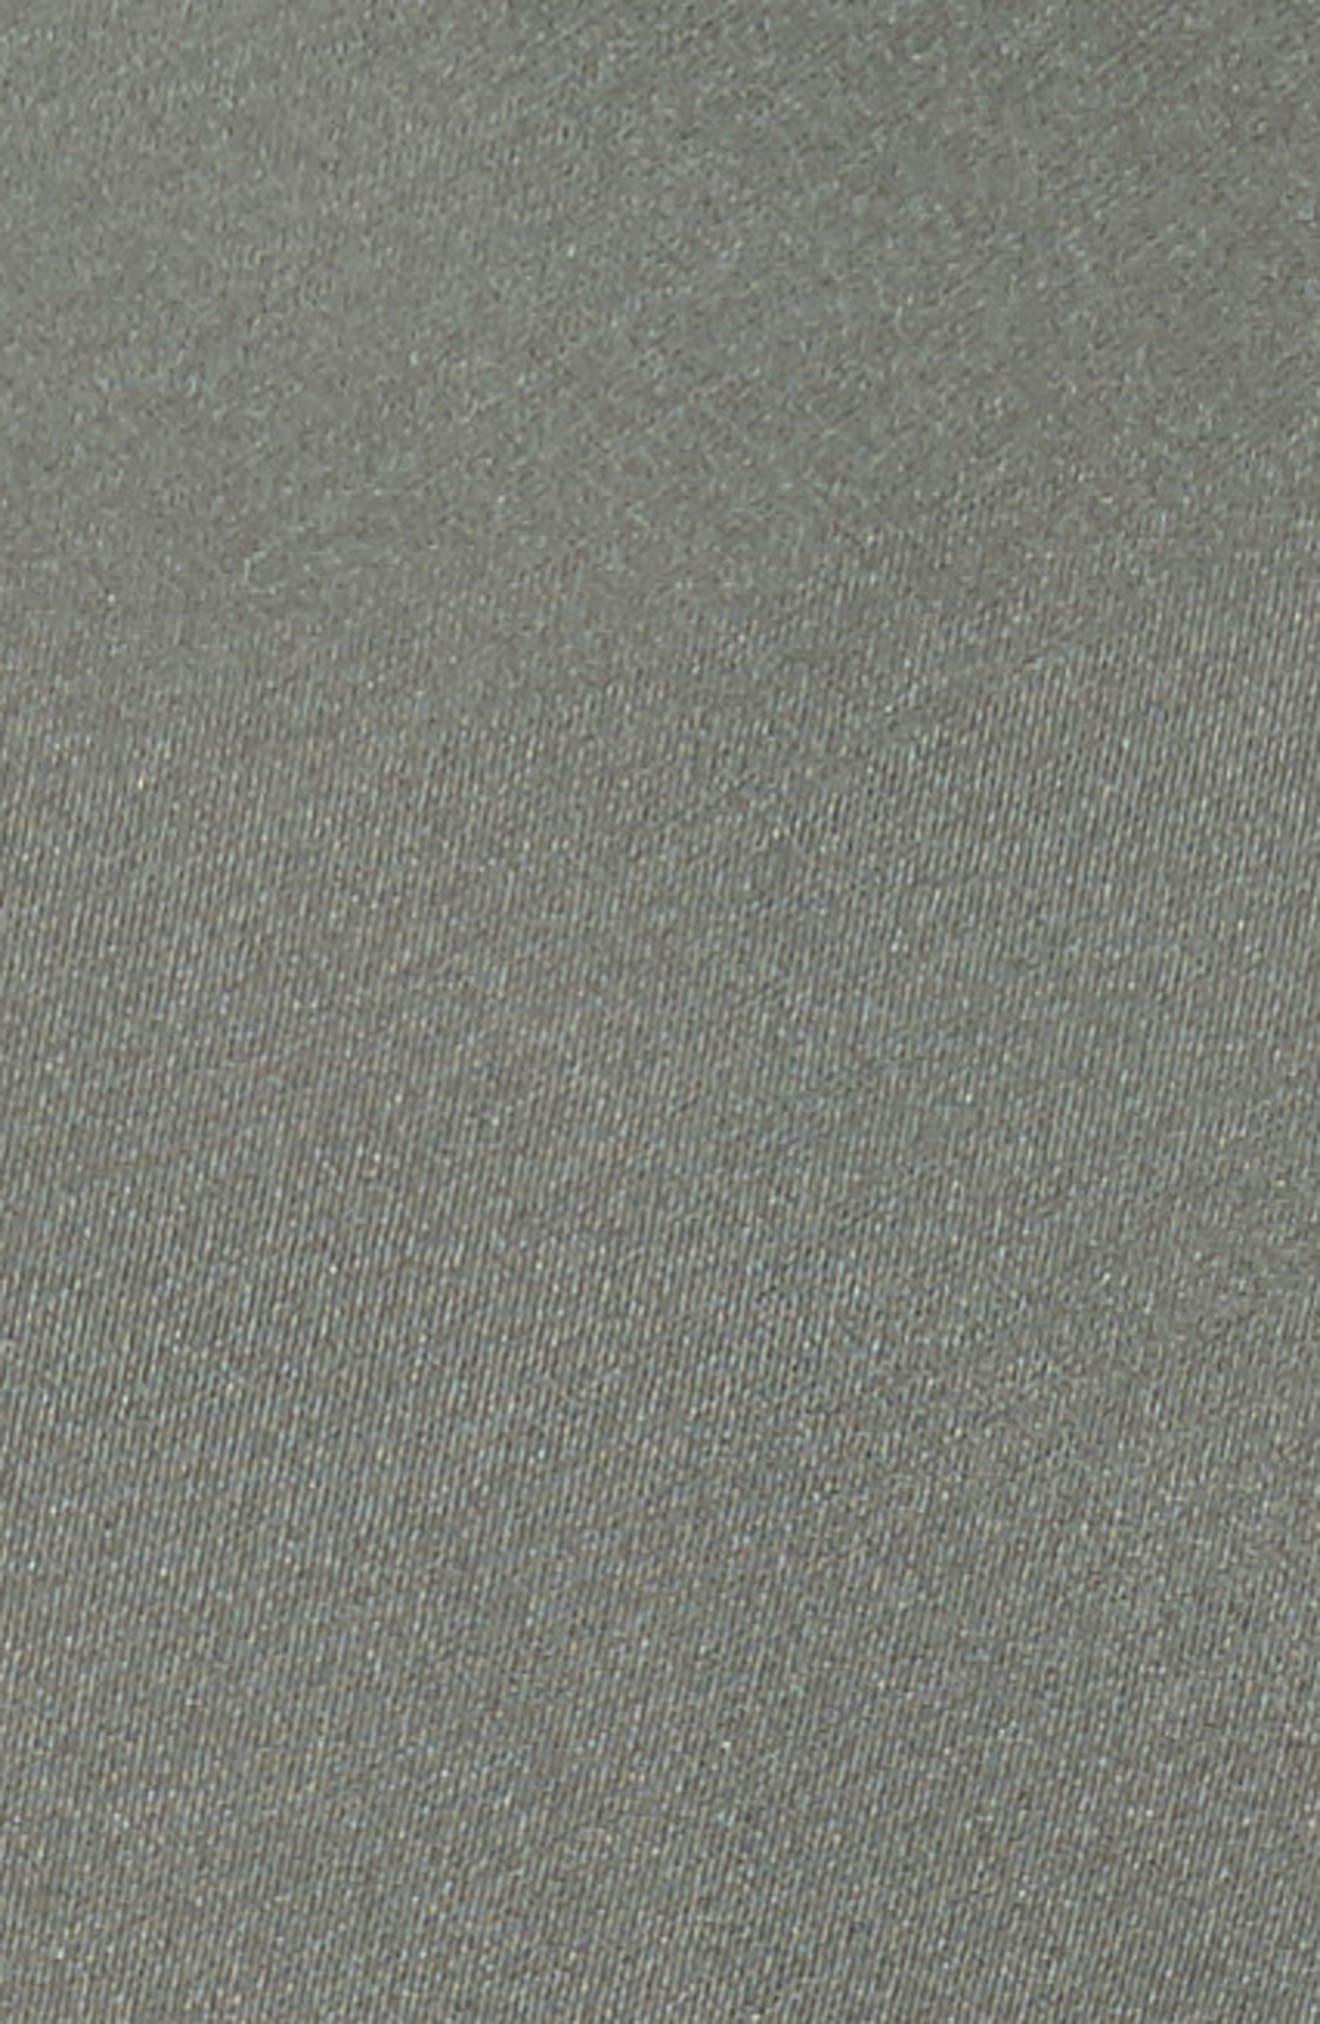 Silk Chiffon Midi Skirt,                             Alternate thumbnail 5, color,                             Sage